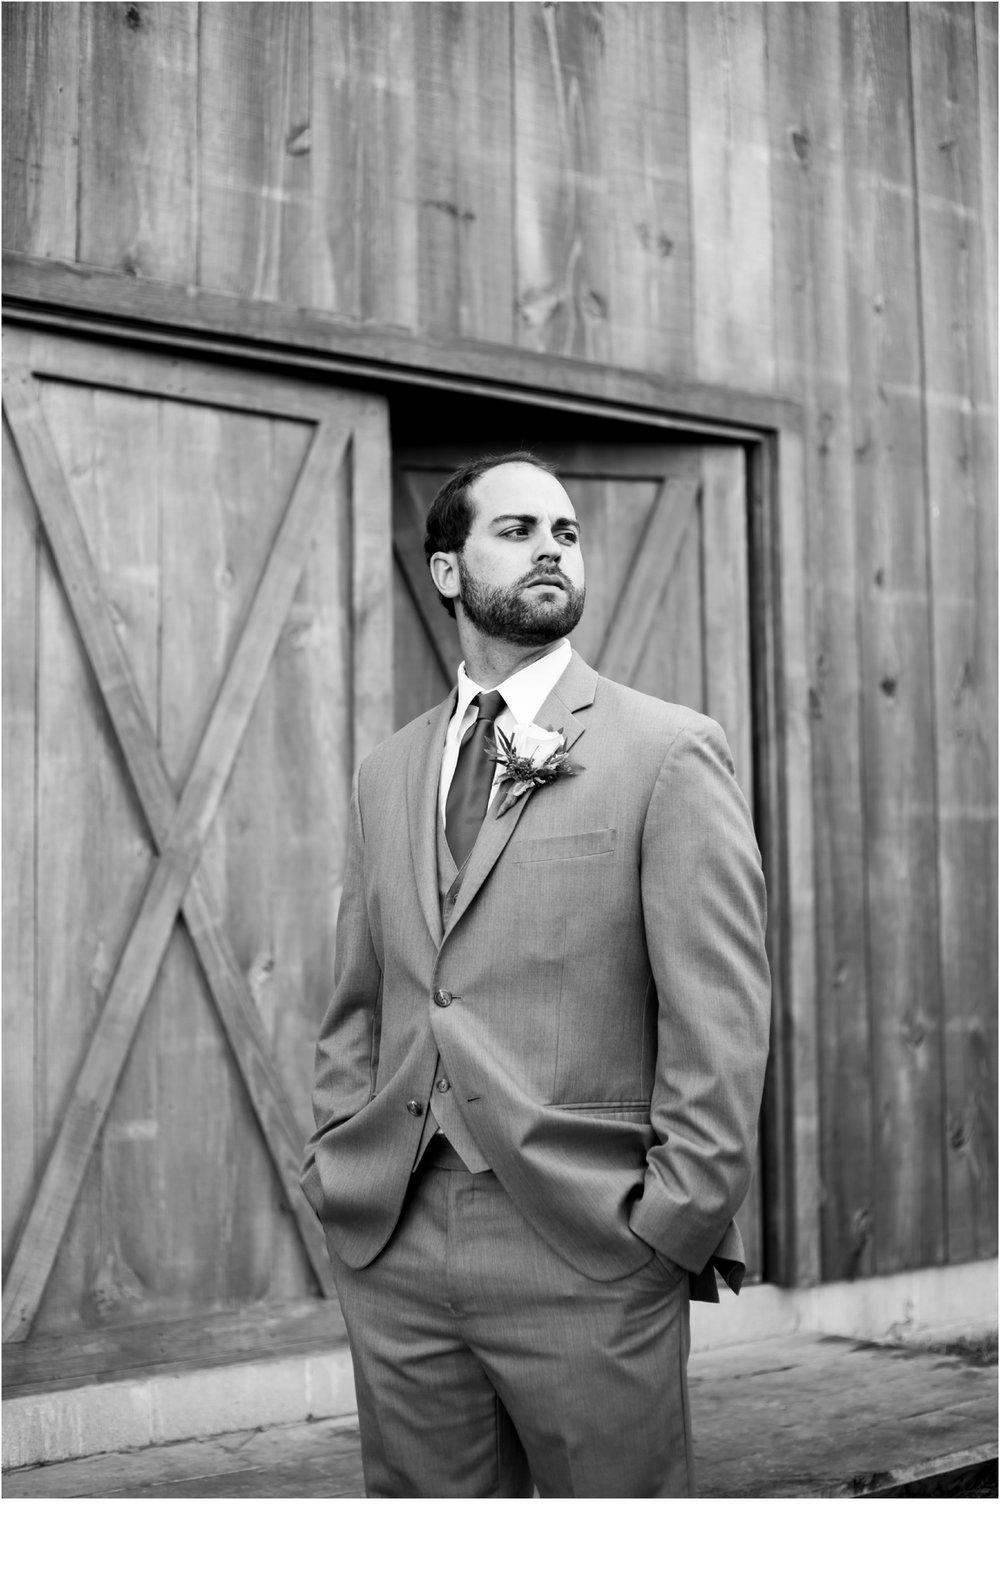 Rainey_Gregg_Photography_St._Simons_Island_Georgia_California_Wedding_Portrait_Photography_0486.jpg